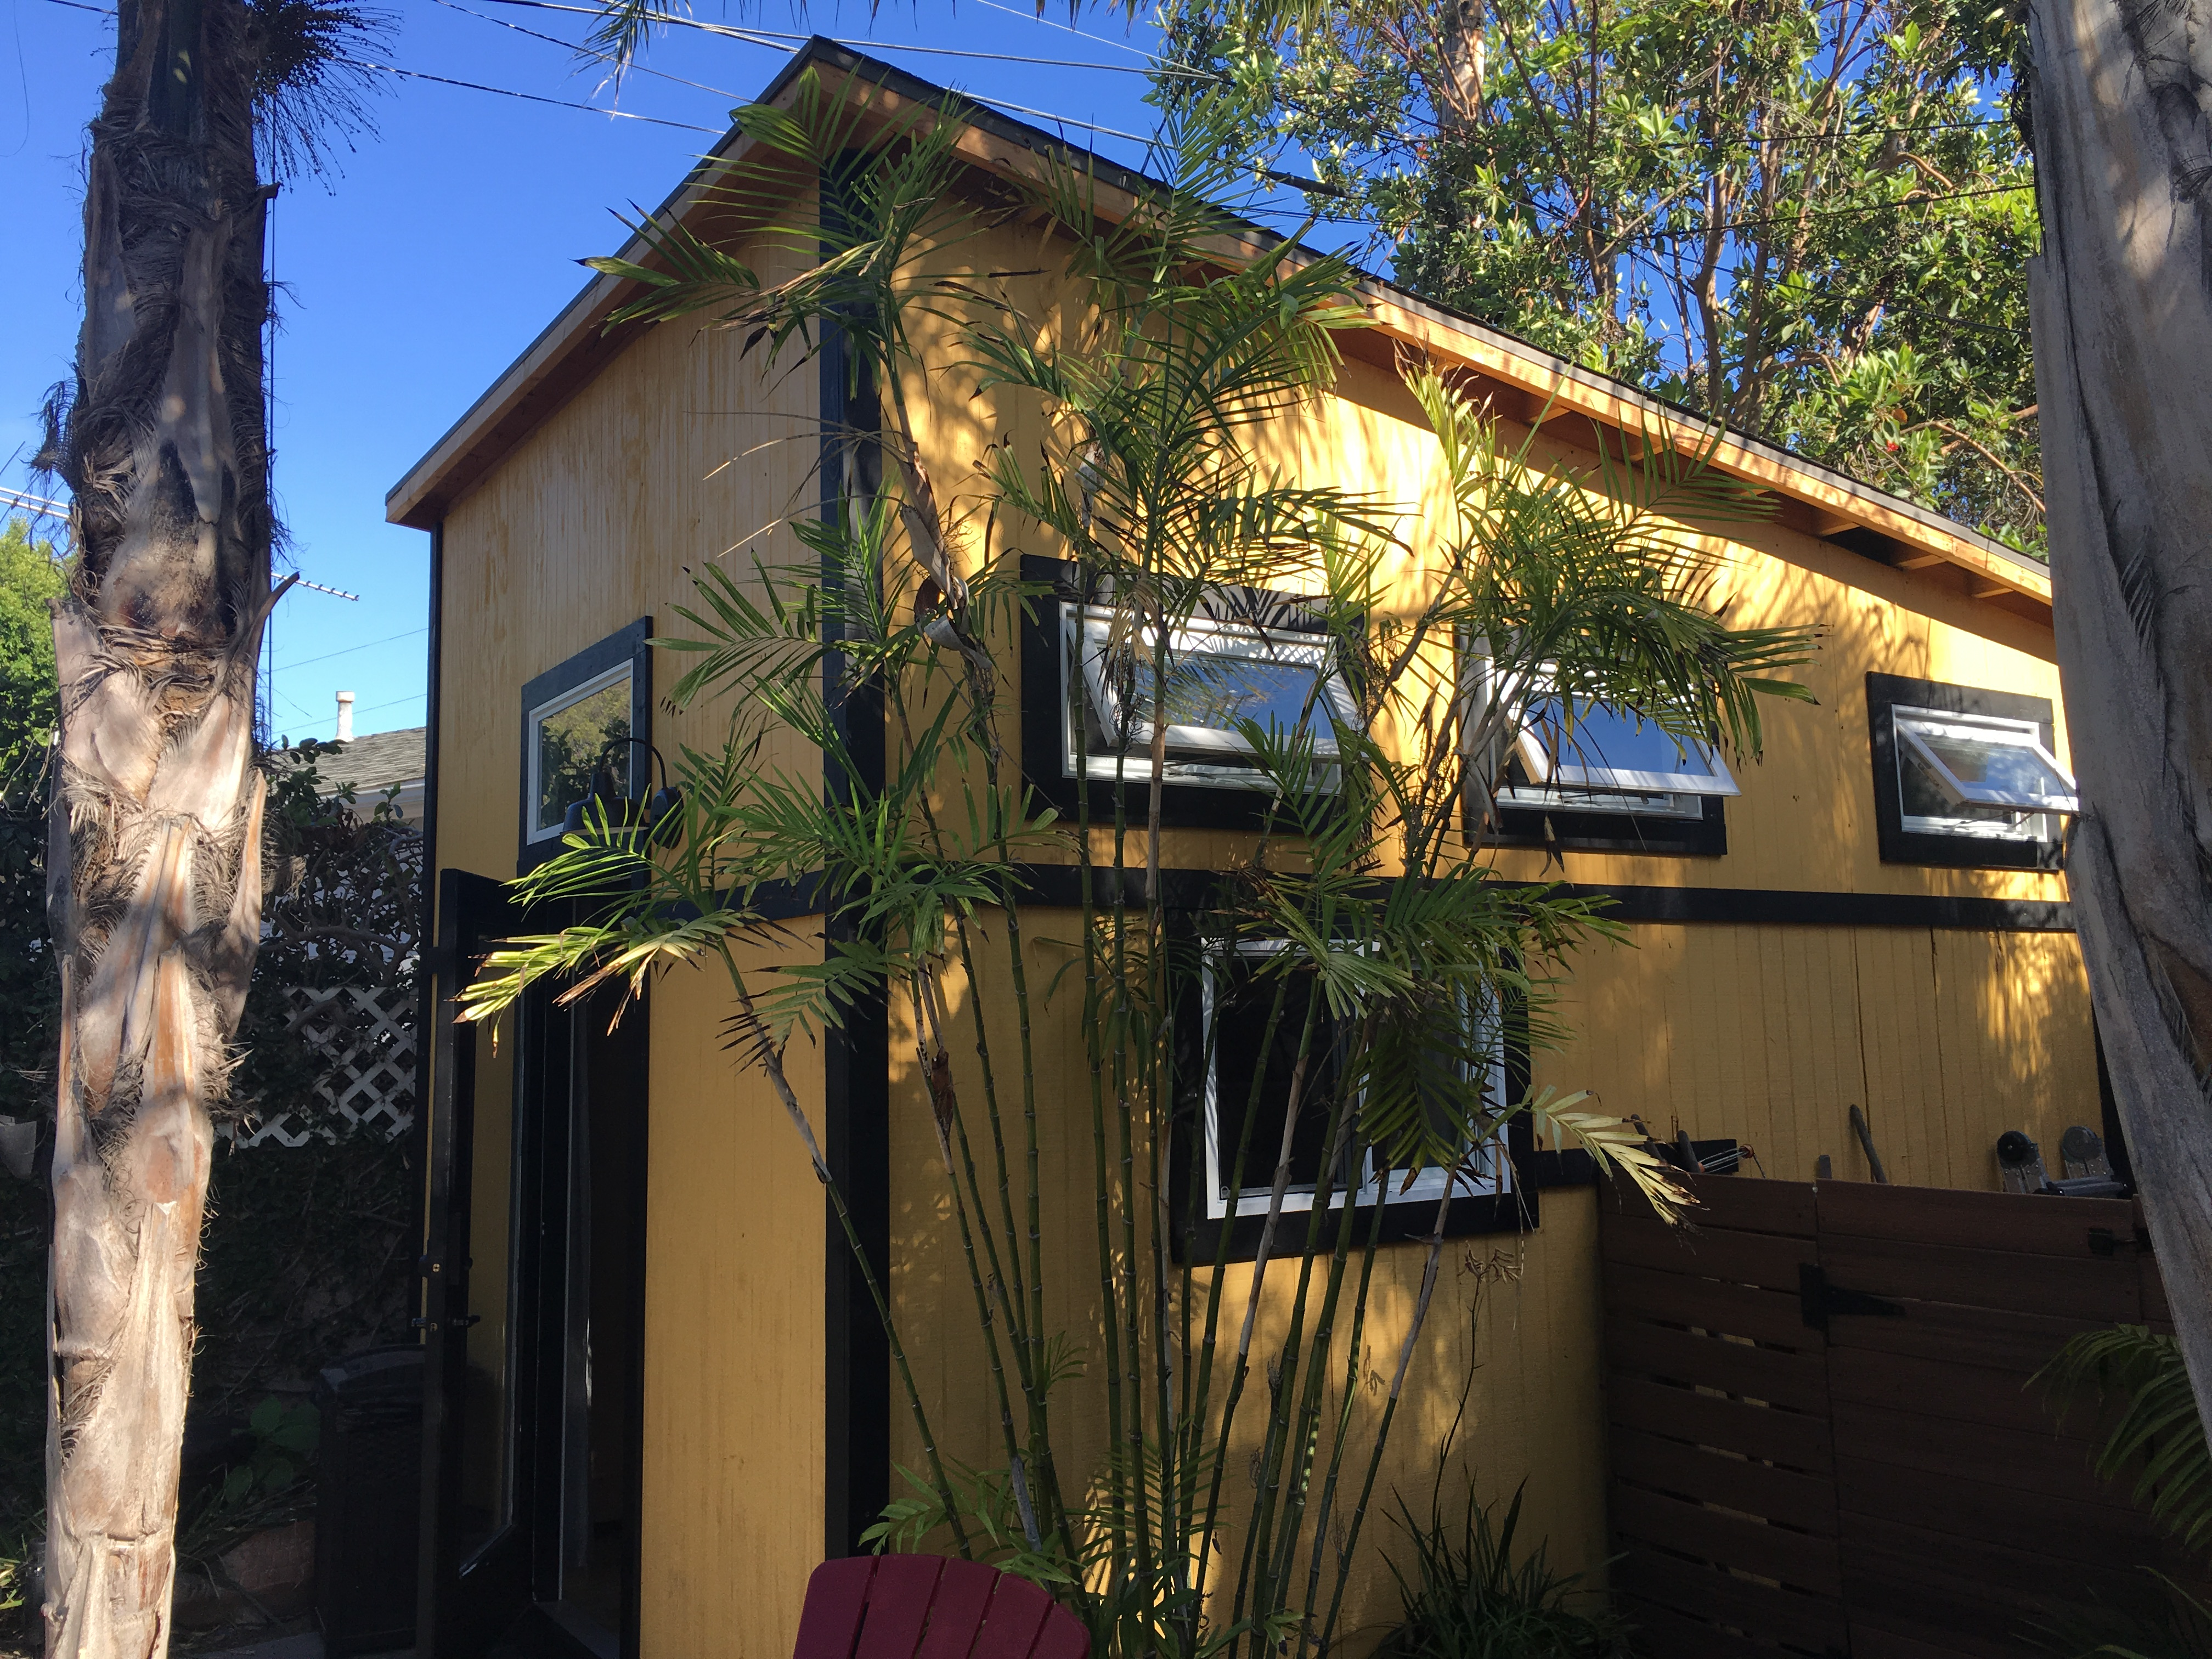 Los Angeles Tiny Houses Curbed LA